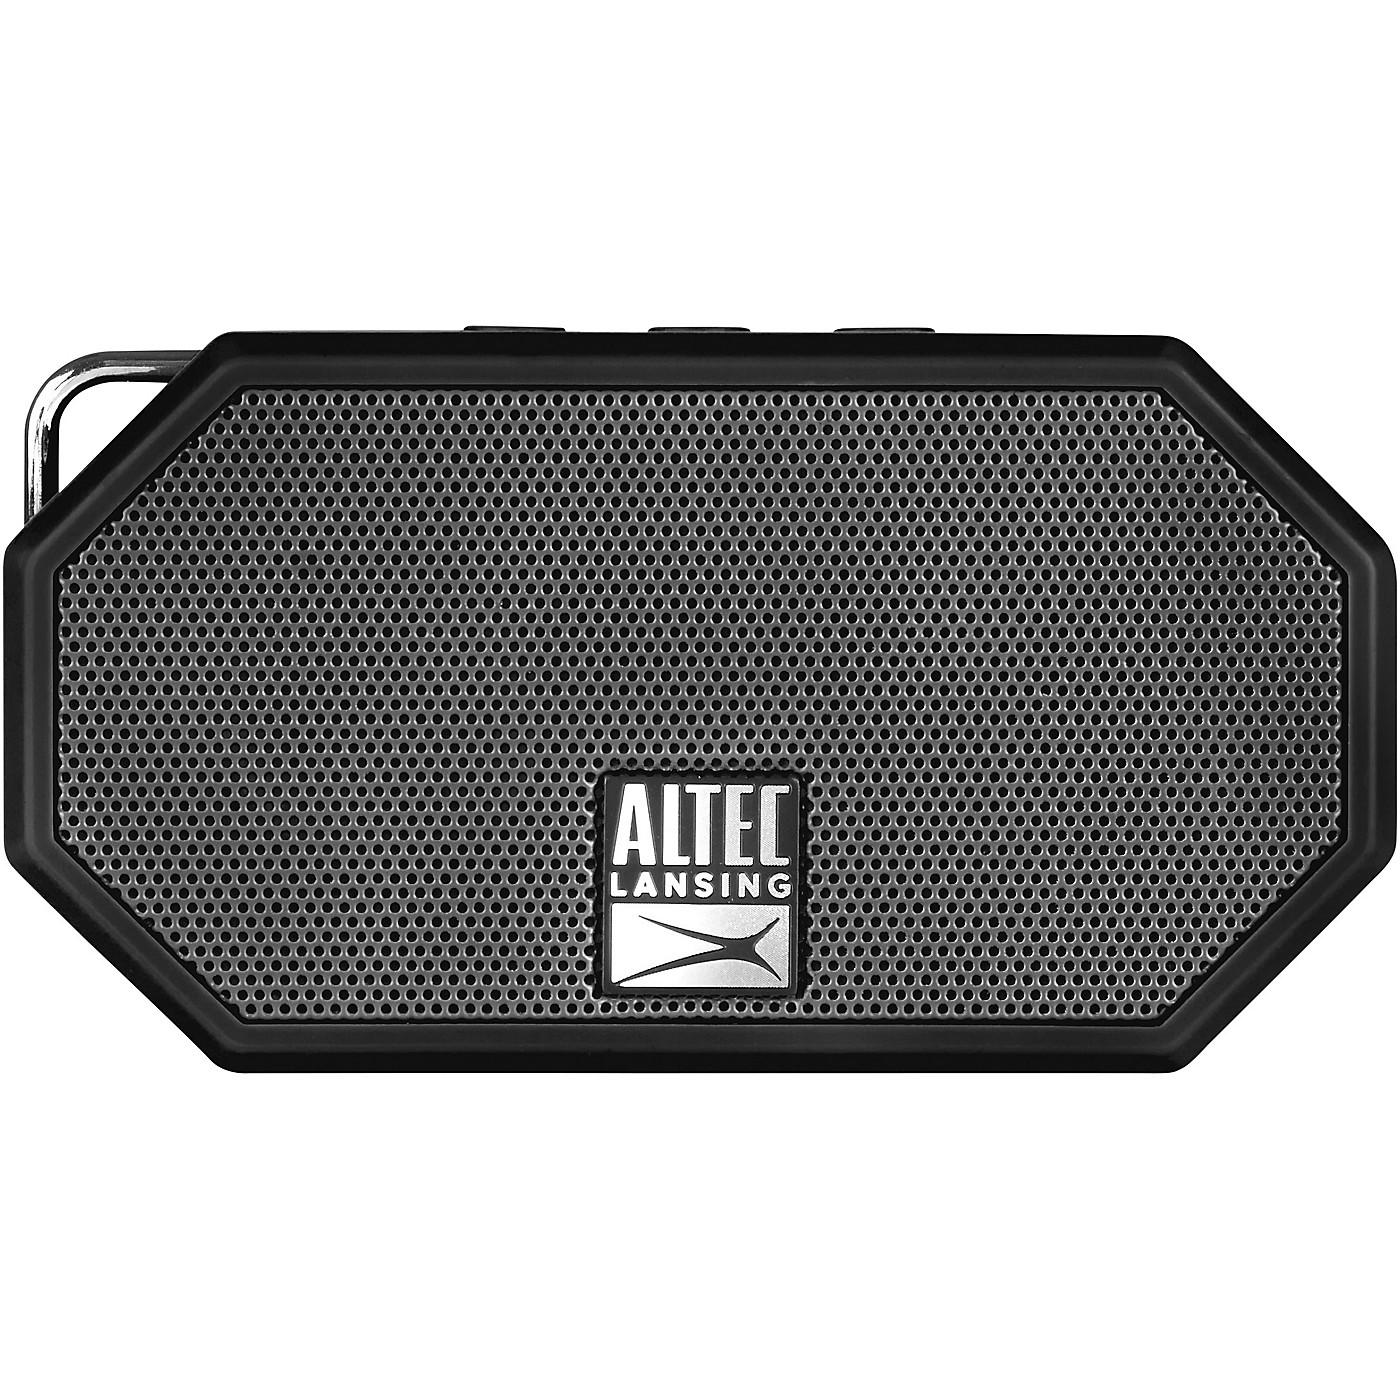 Altec Lansing Mini H2O 3 Portable Waterproof Bluetooth Speaker thumbnail